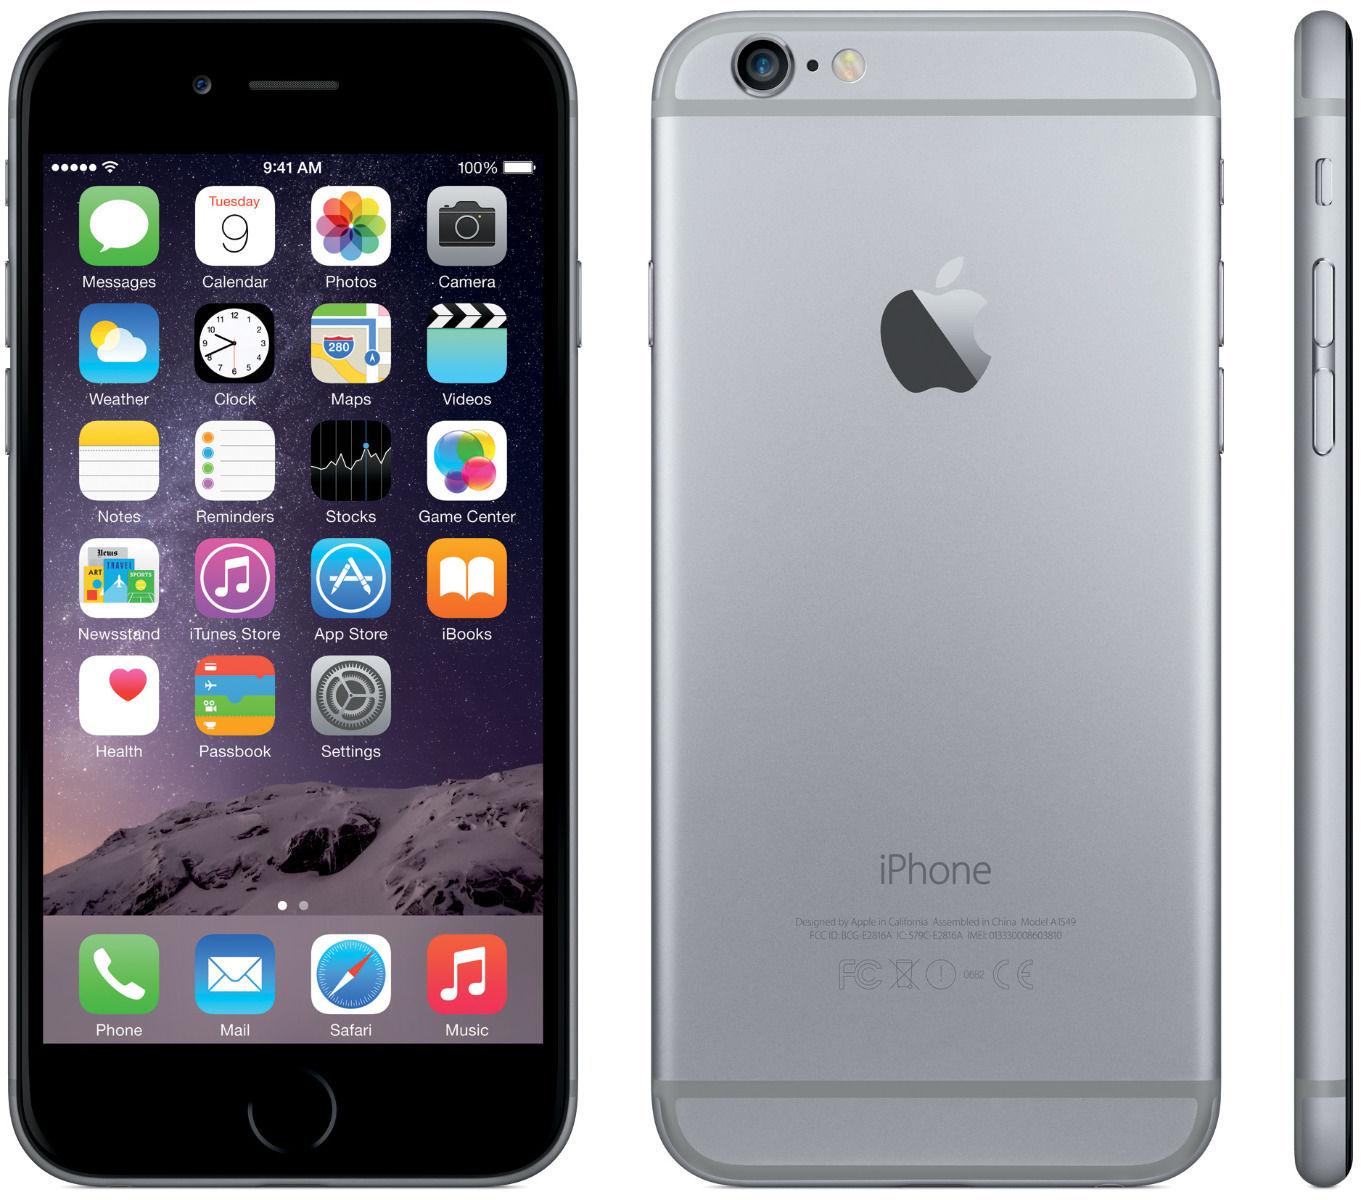 apple iphone 6 16gb unlocked gsm ios smartphone black. Black Bedroom Furniture Sets. Home Design Ideas